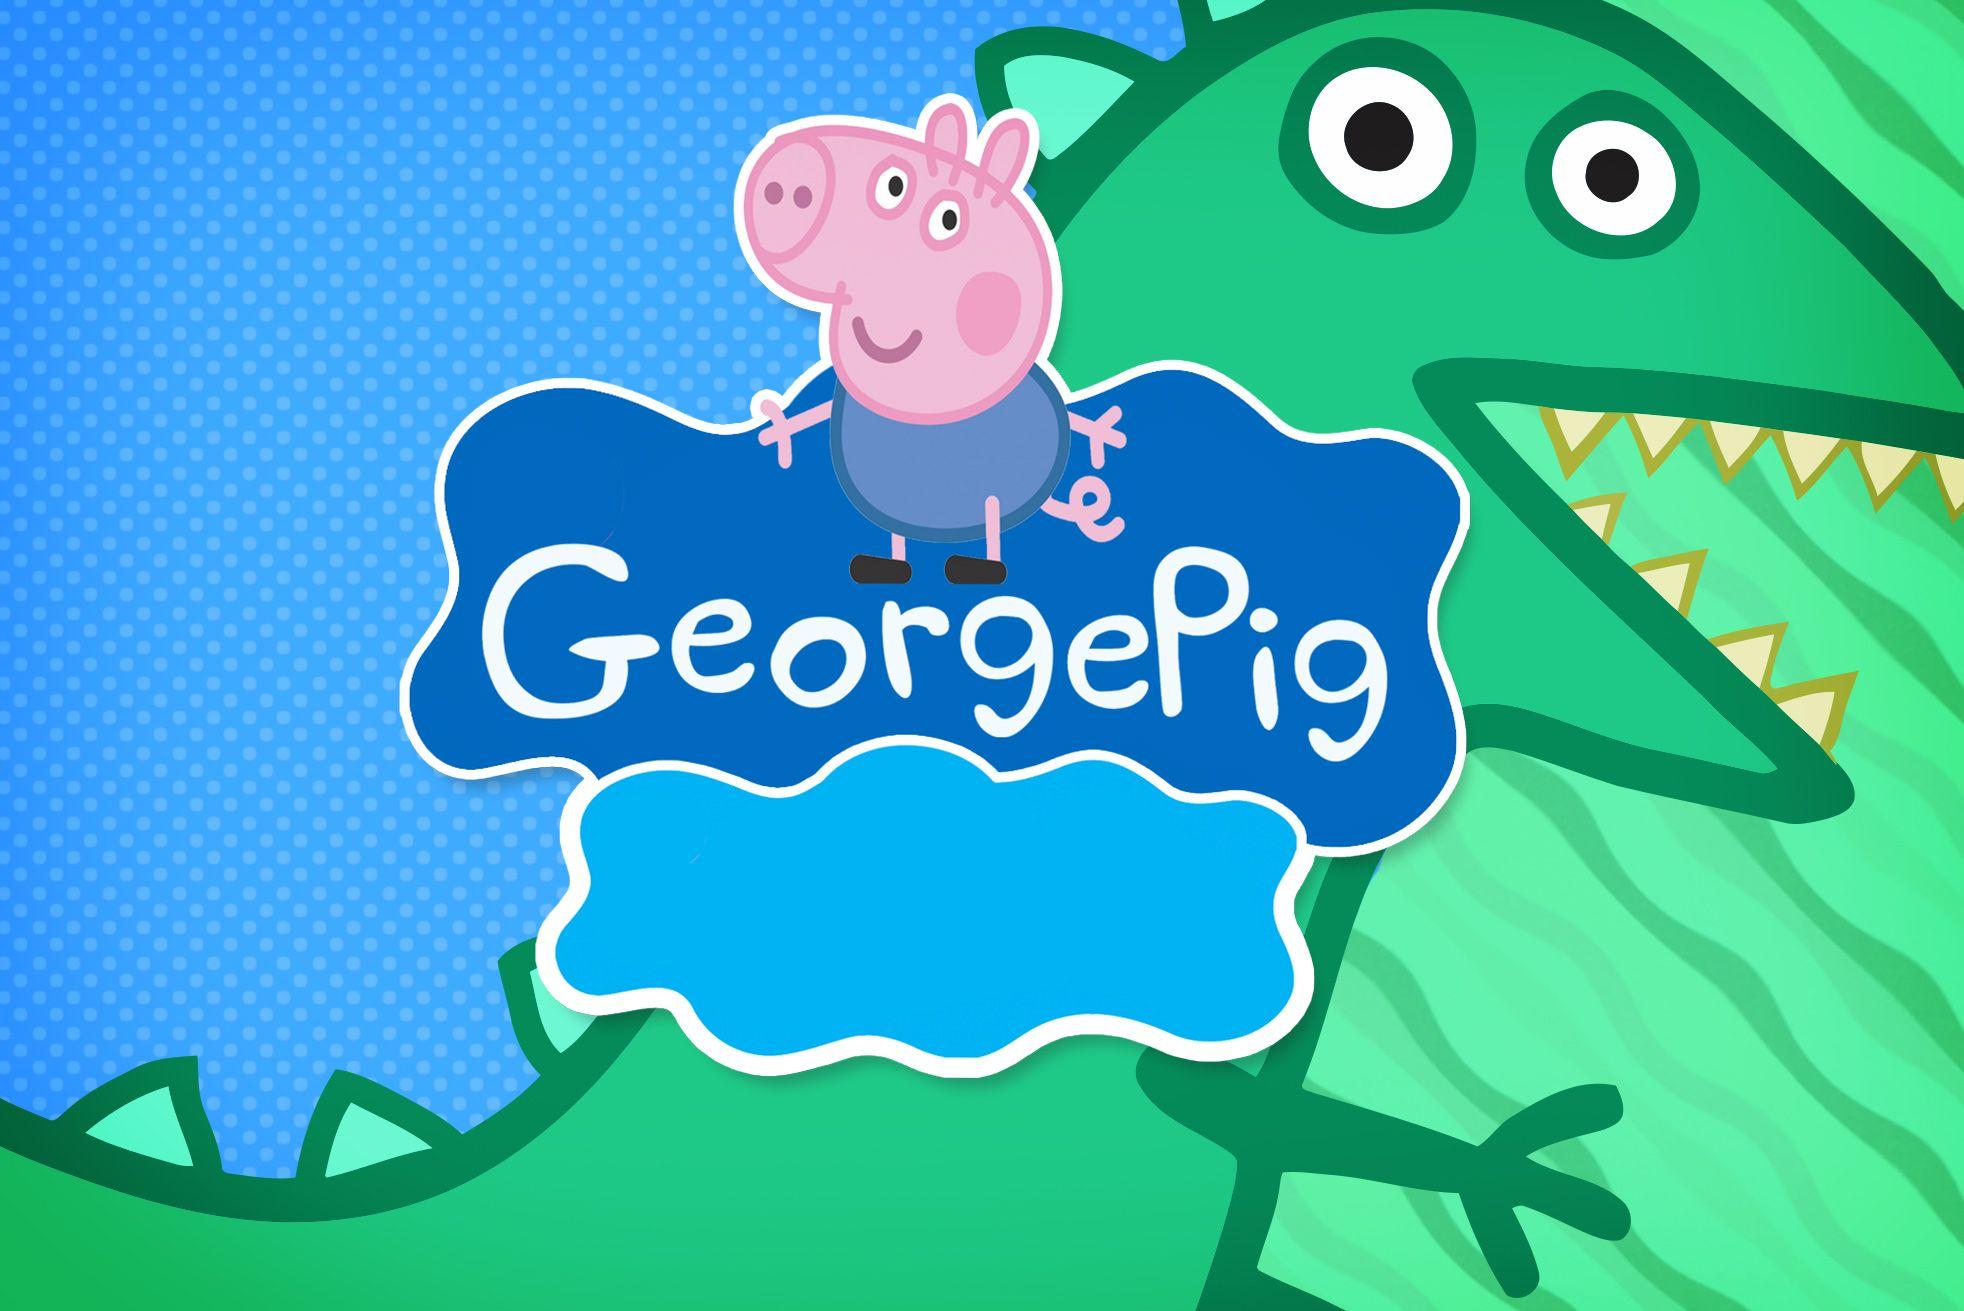 george pig cavaleiro - Google Search